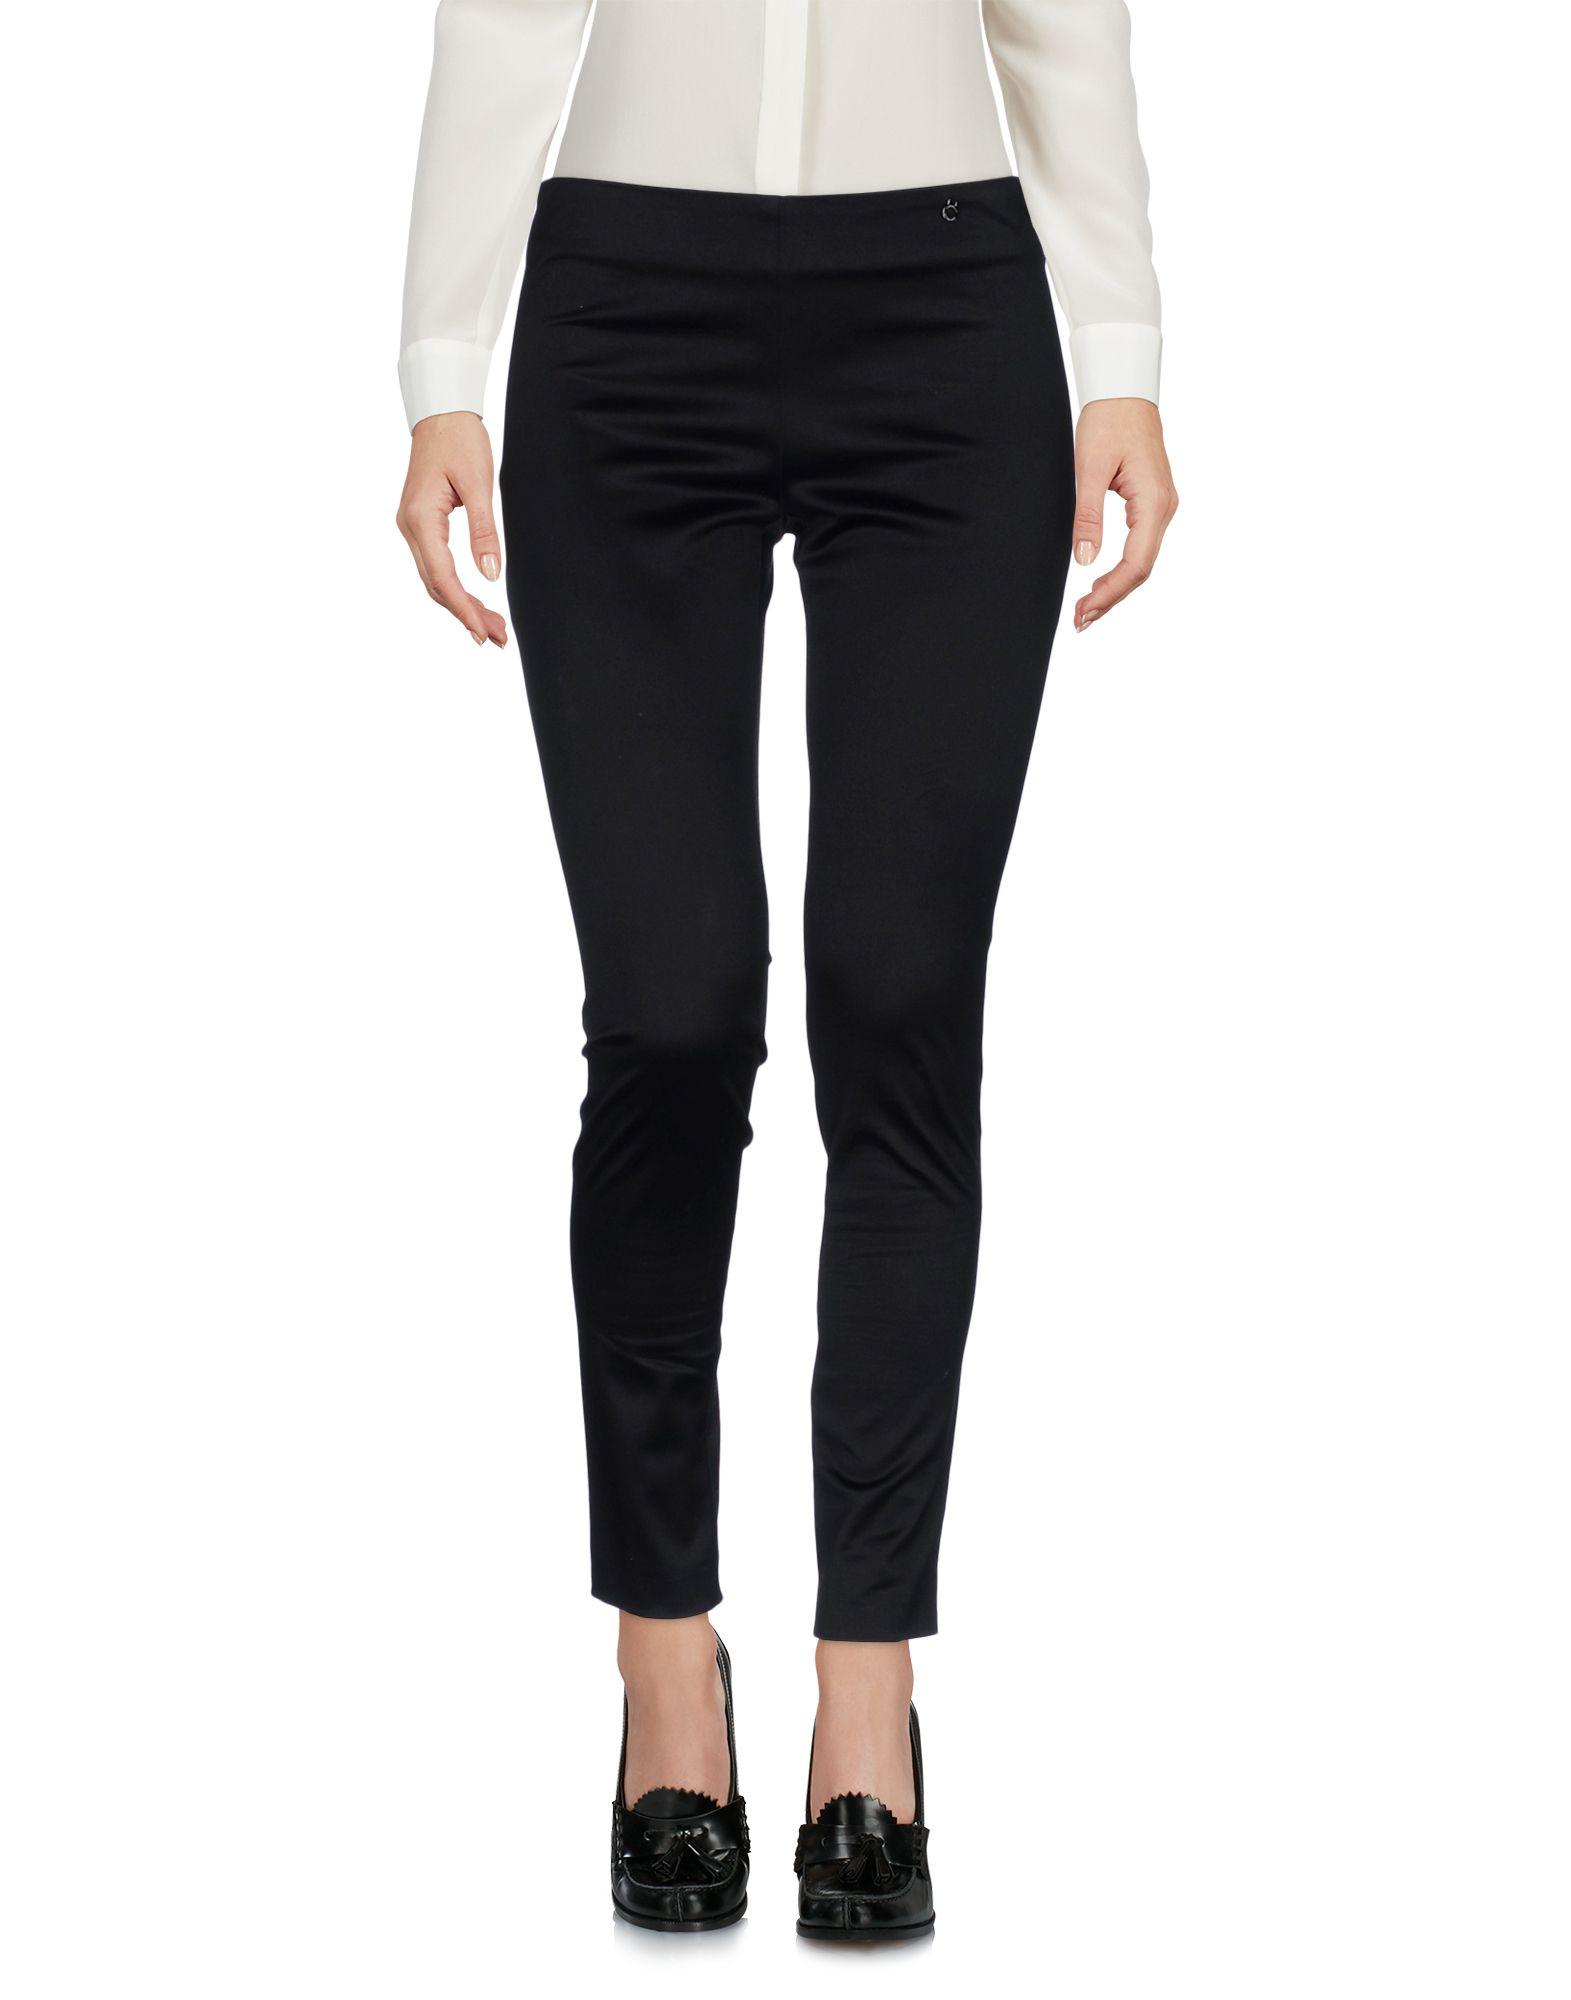 ANNARITA N Повседневные брюки desert mannequin x n duo повседневные брюки